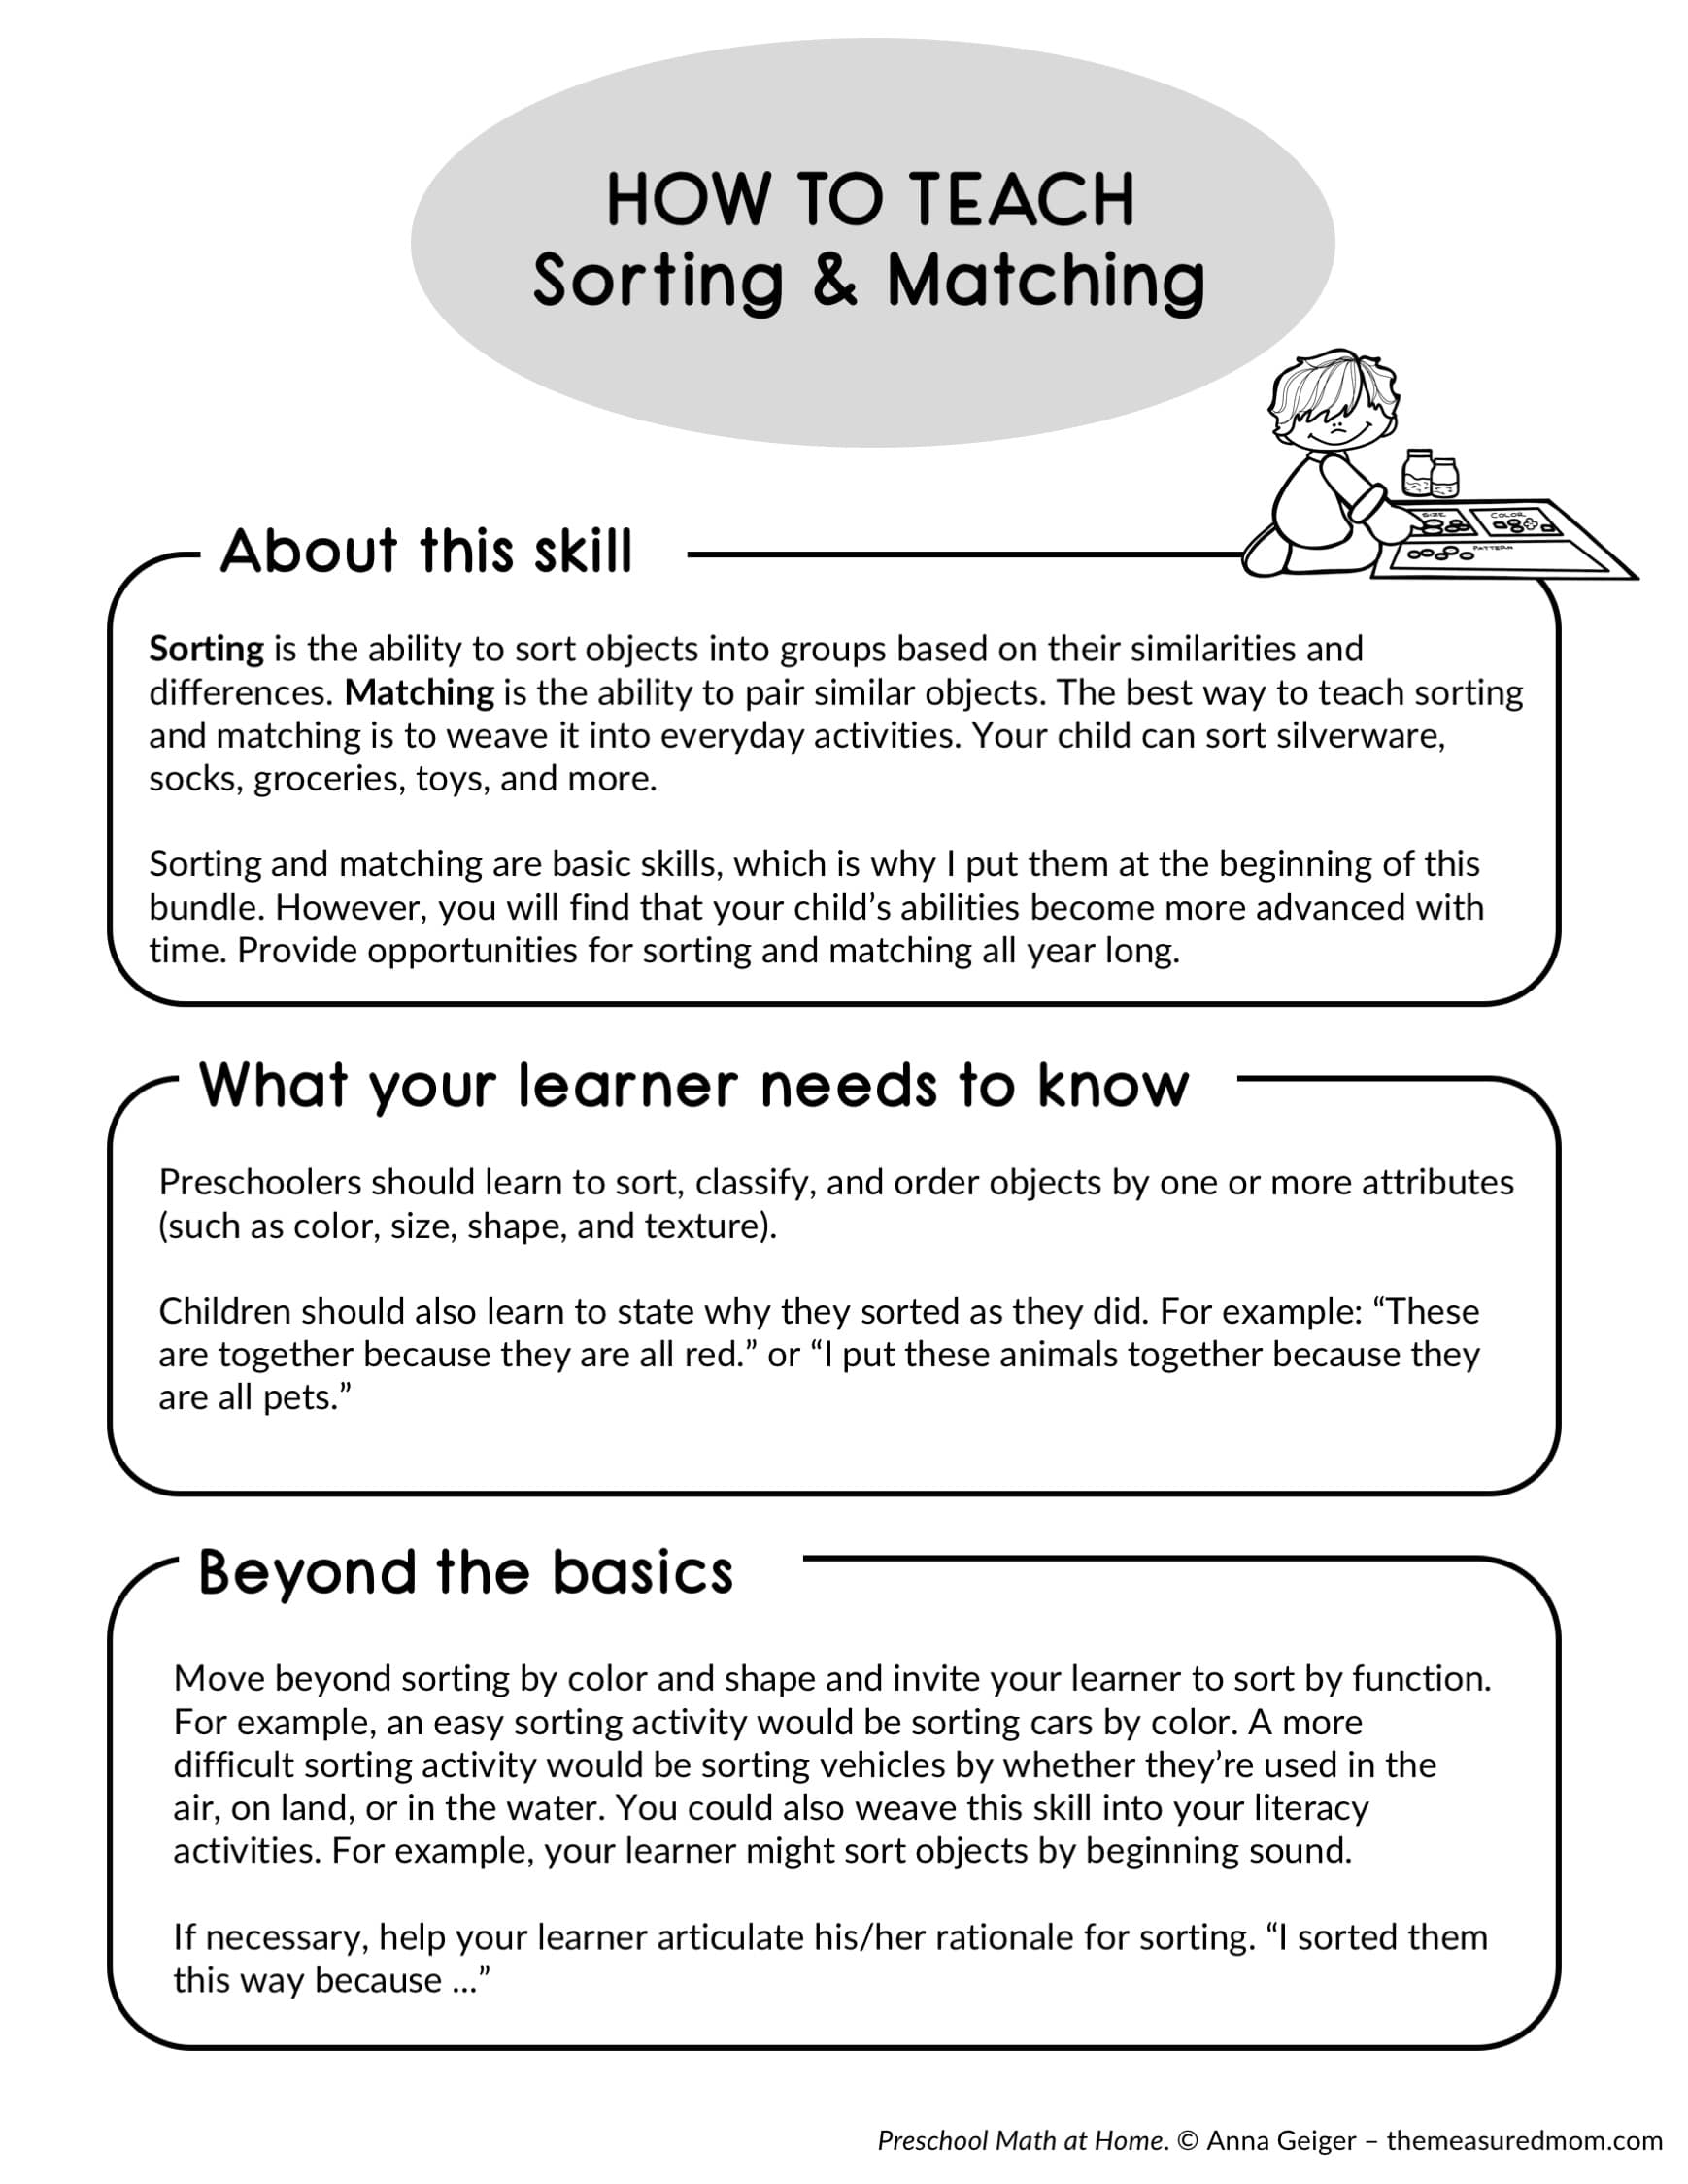 Preschool Math Curriculum For Home